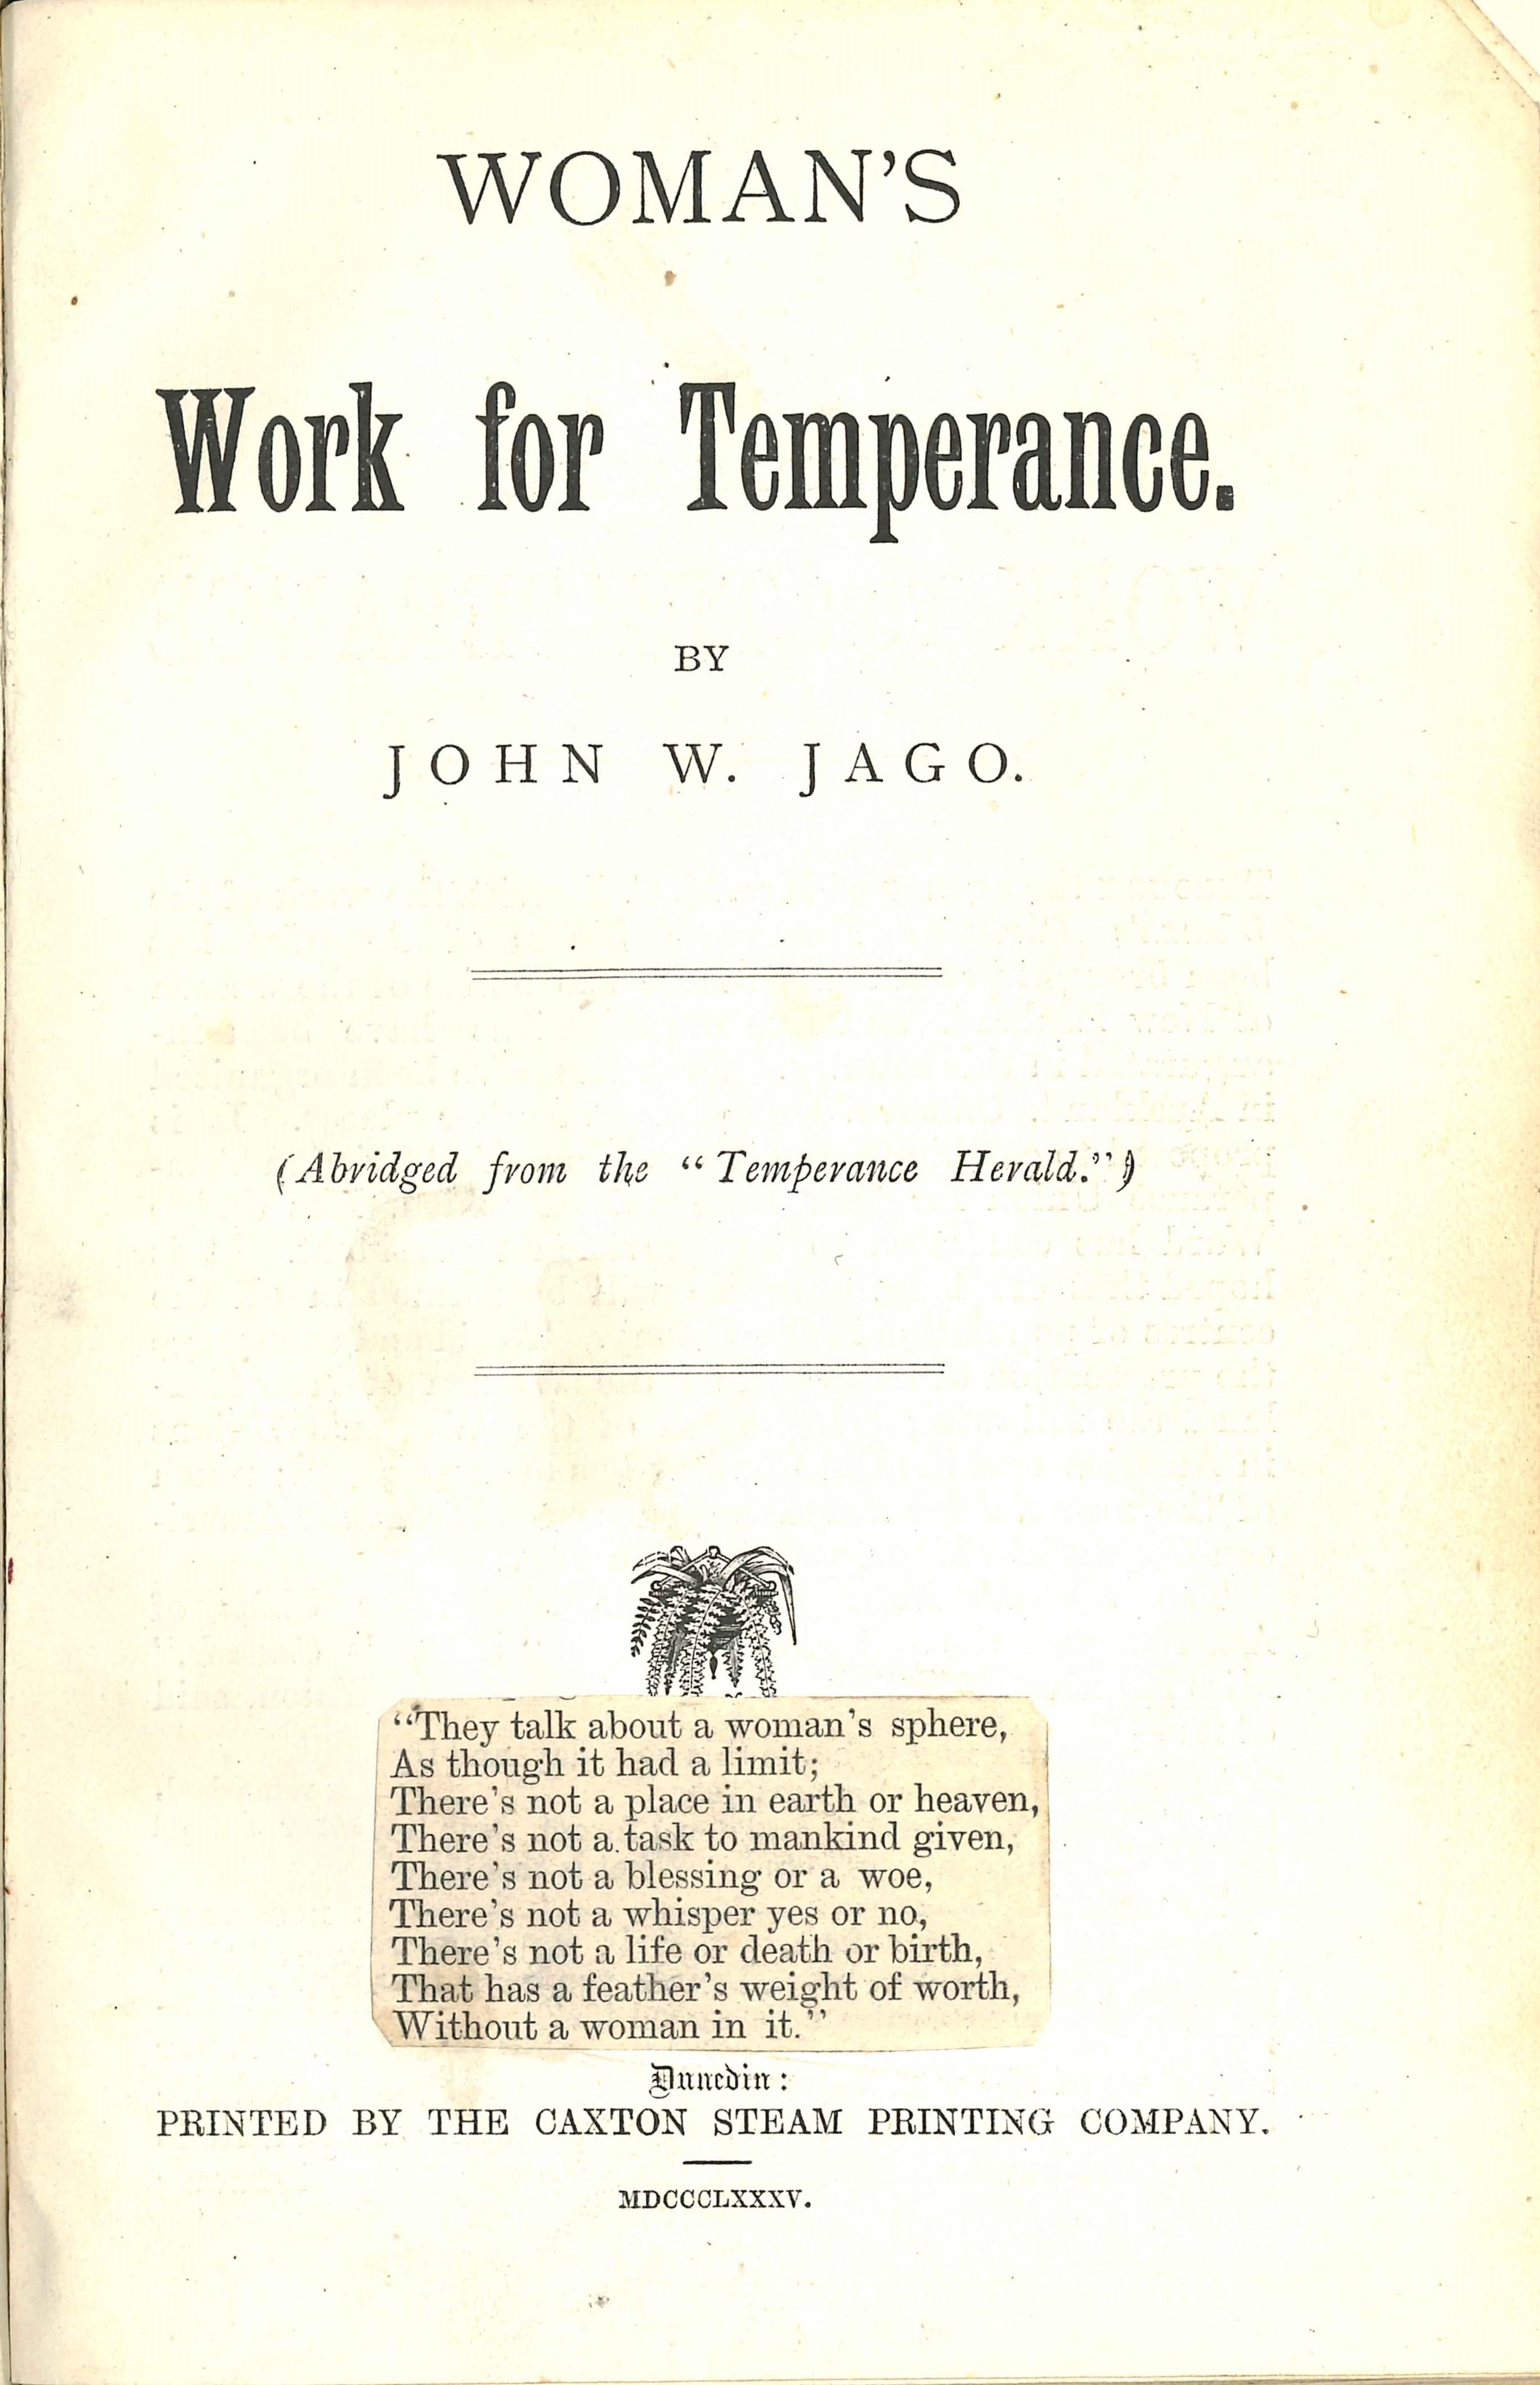 John W. Jago. Woman's work for temperance. Dunedin: Caxton Steam Printing Co., 1885.